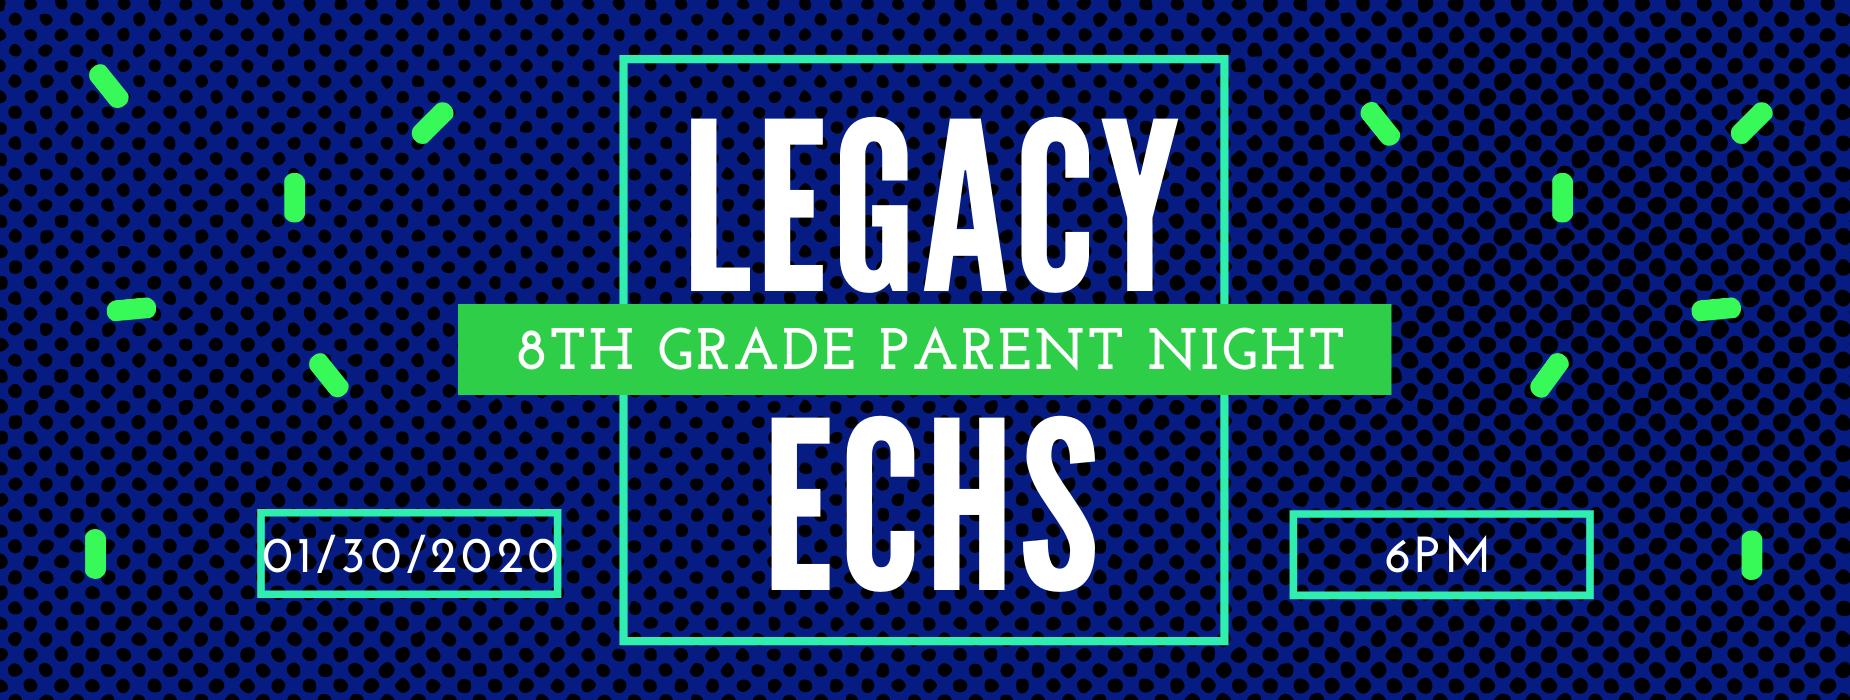 8th Grade Parent Night 1/30 at 6pm